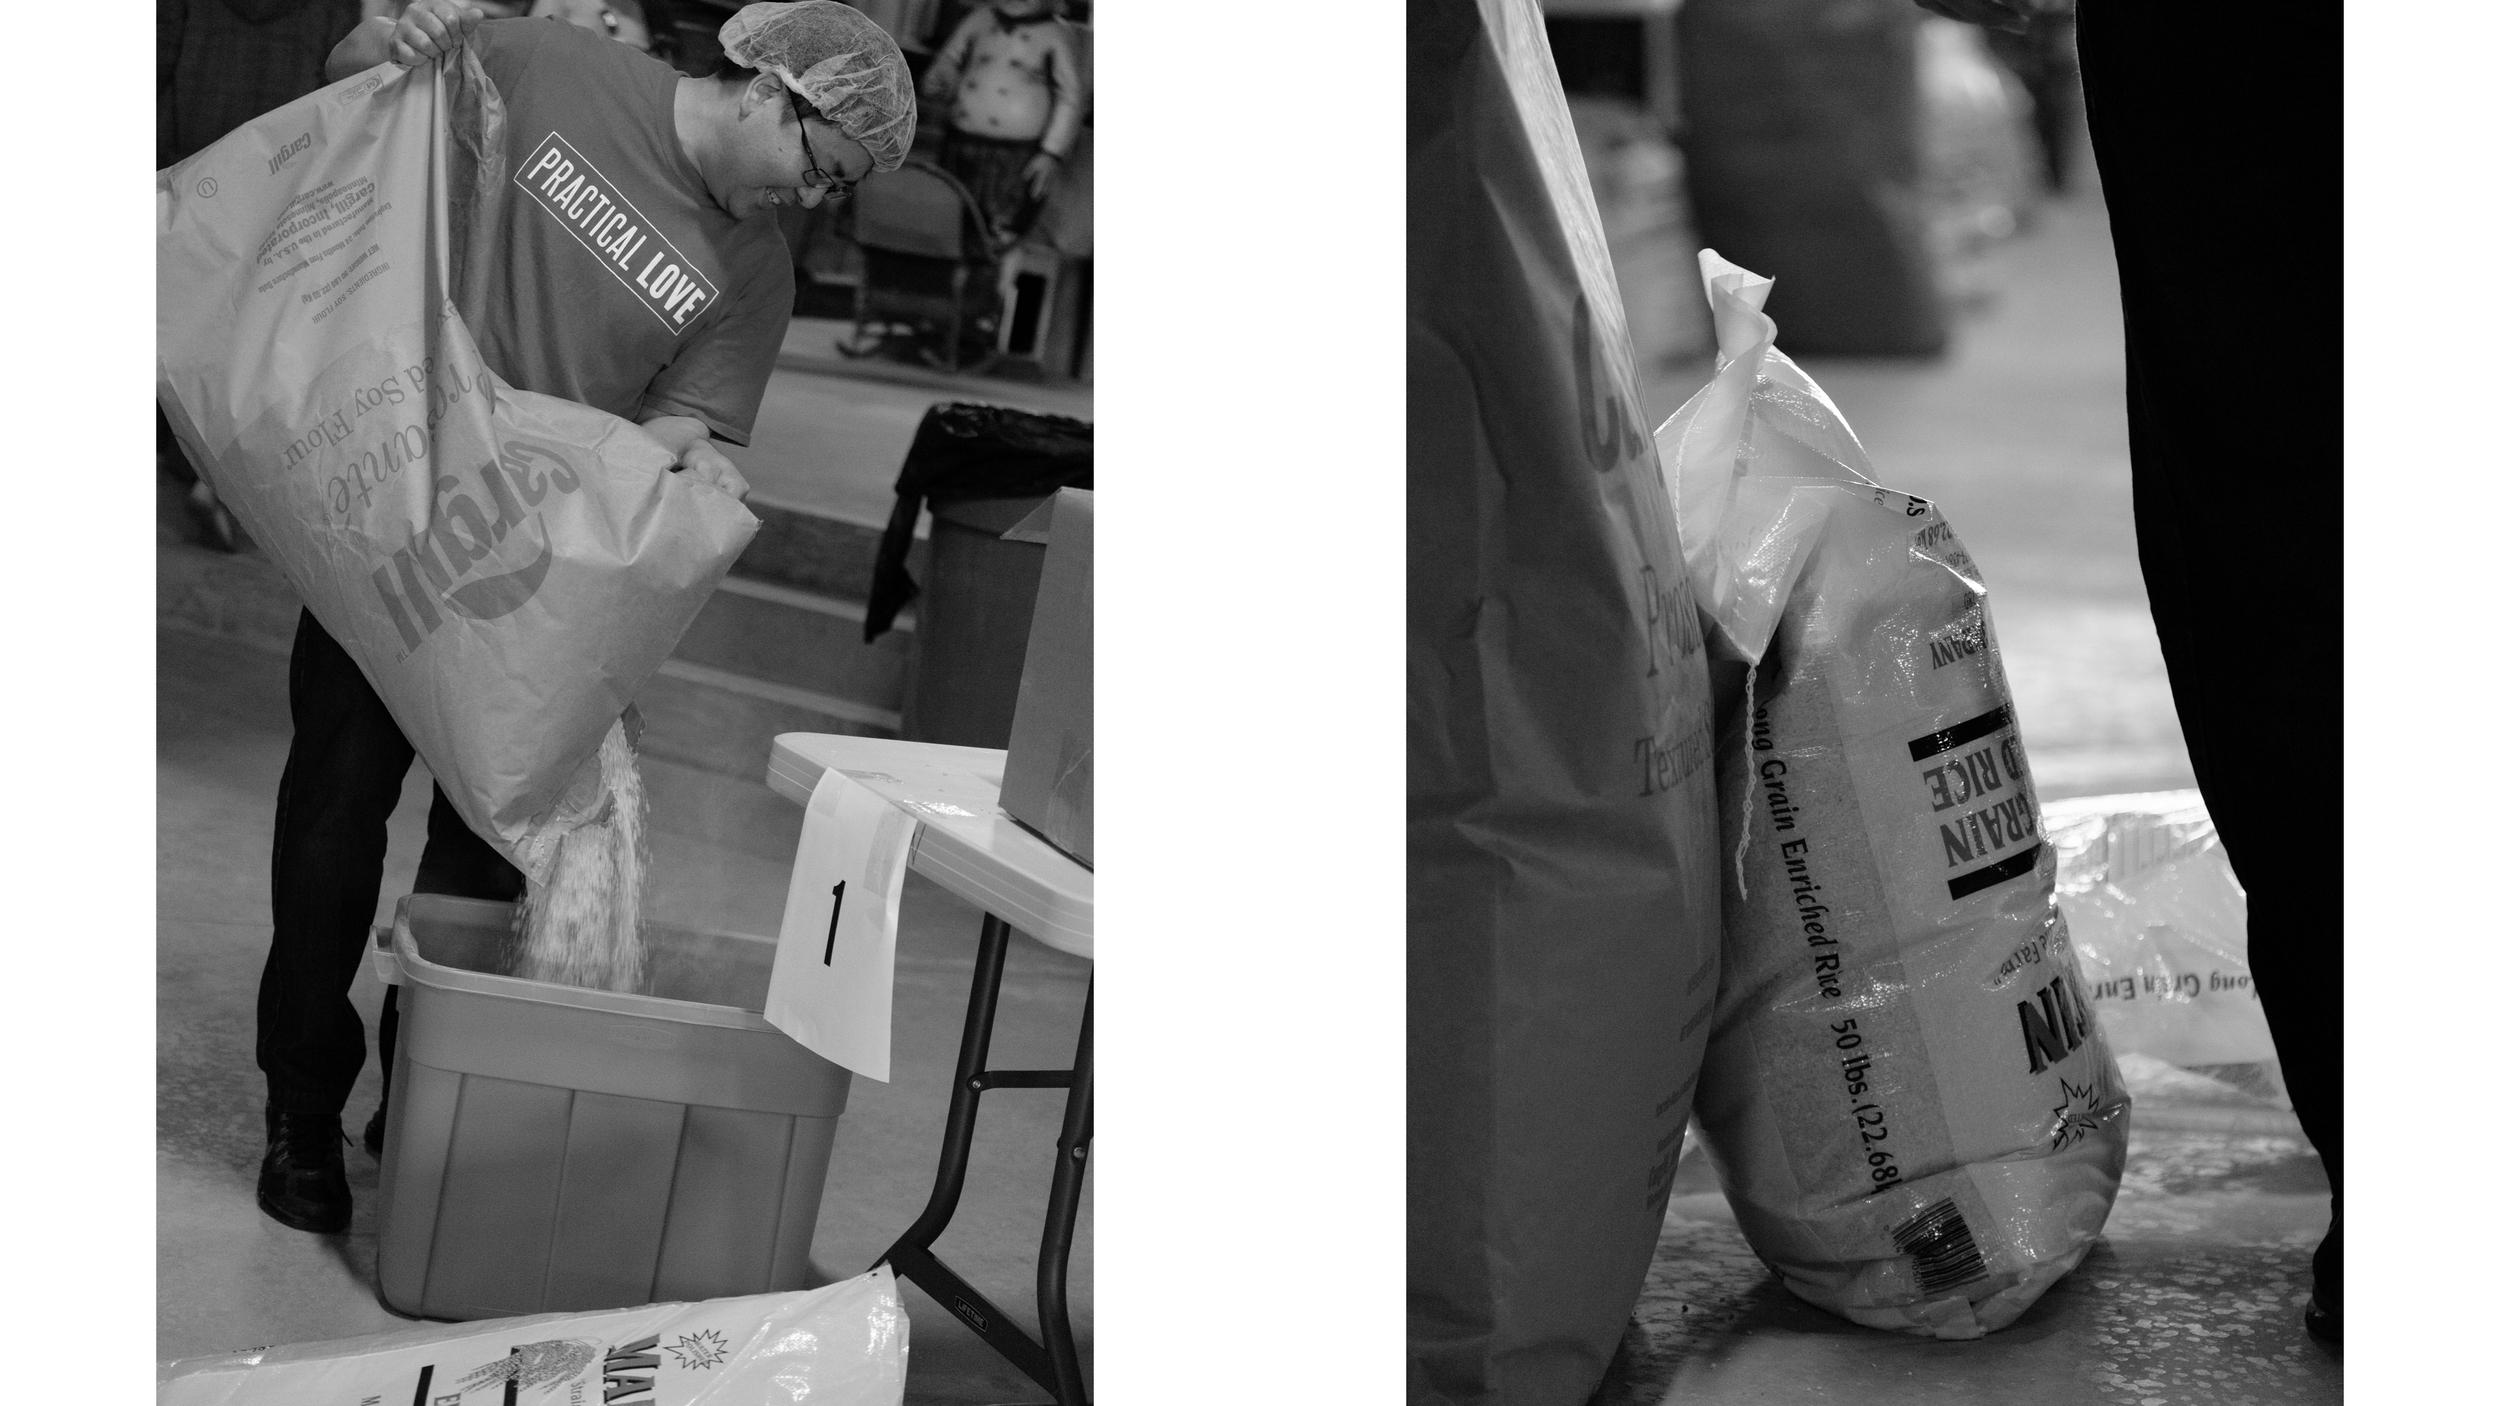 Humanitarian-food-packing-portrat-multiple-1.jpg